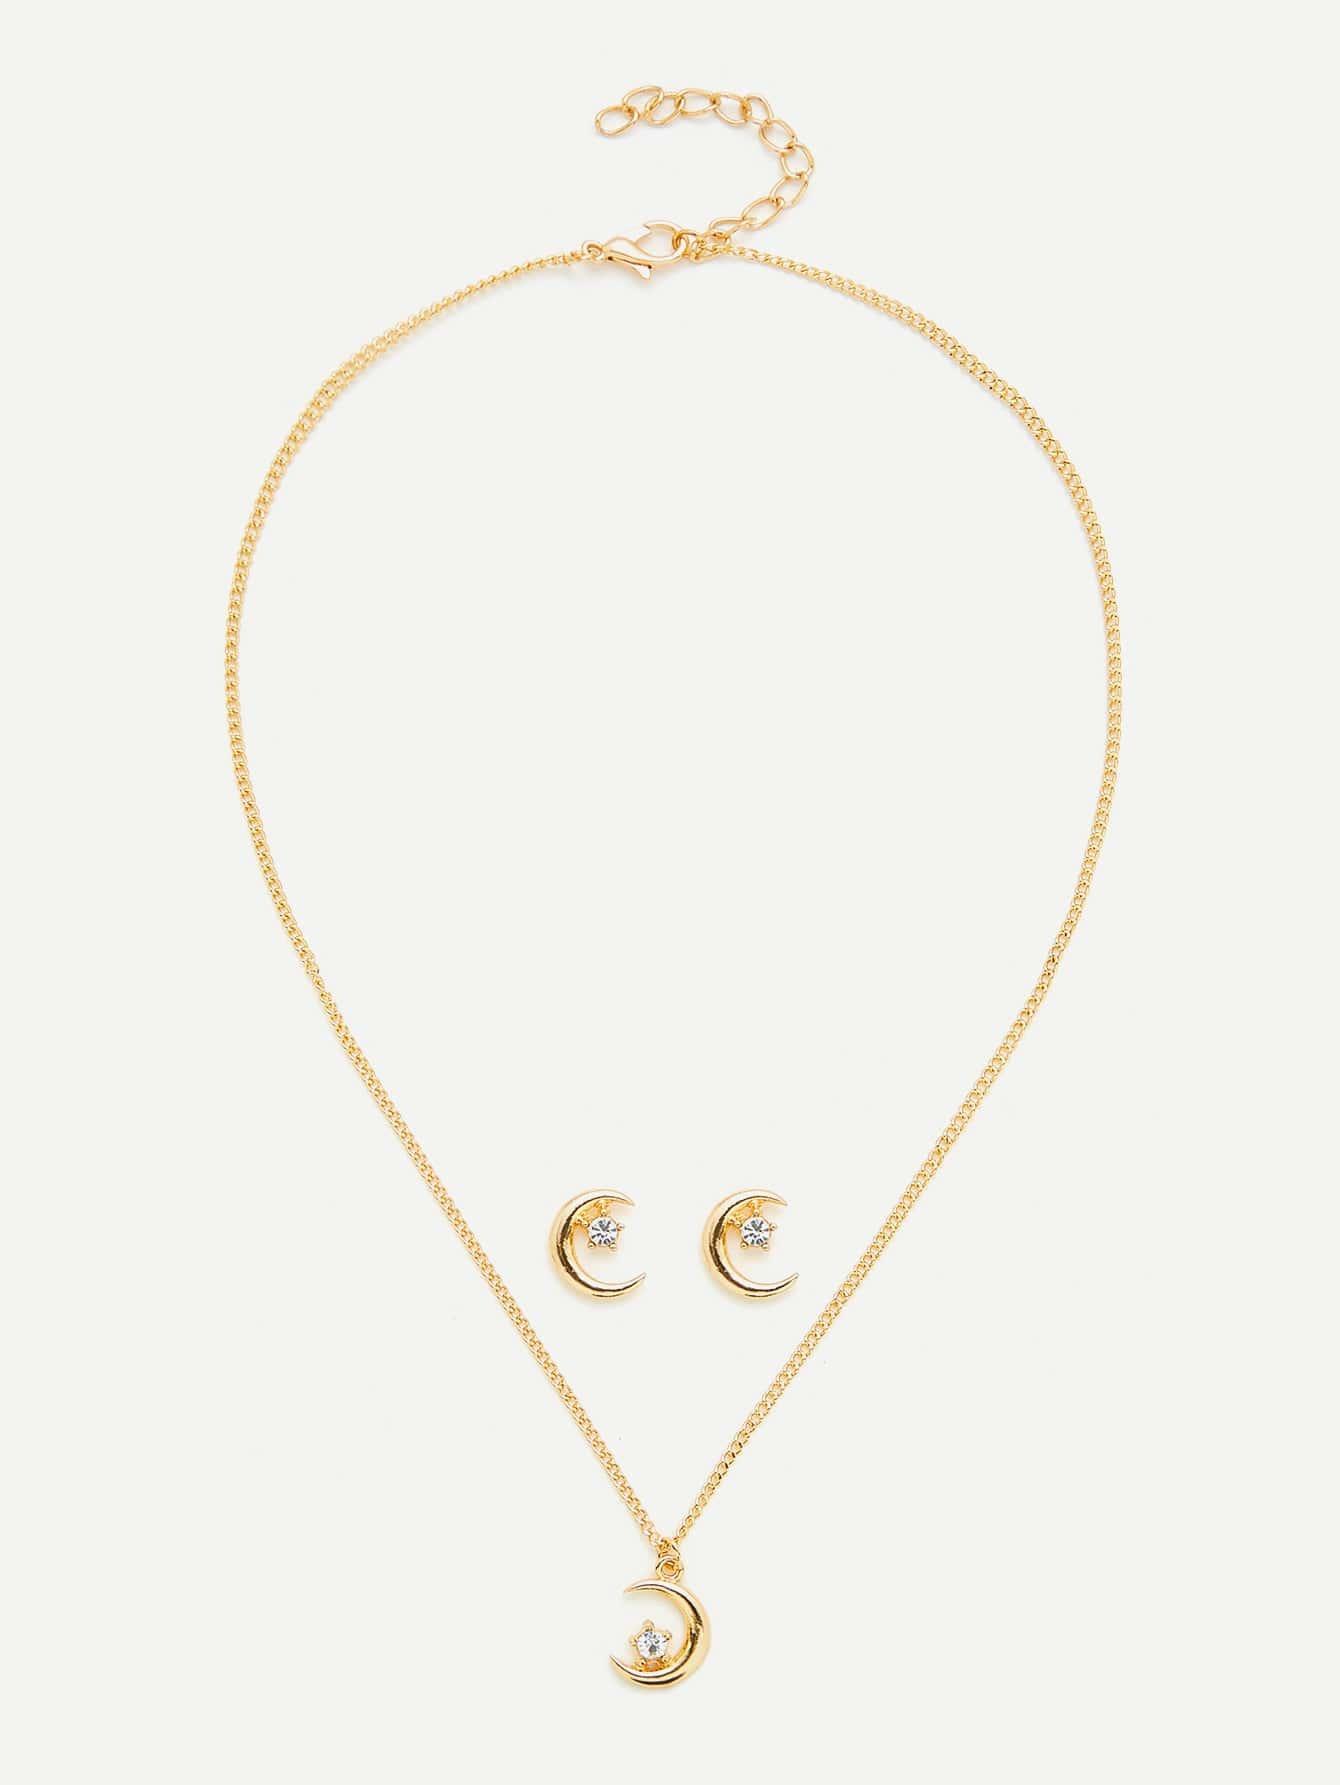 Moon Design Pendant Necklace & Earring Set er 3789 stylish retro jewelled pendant earring navy blue 2 pcs